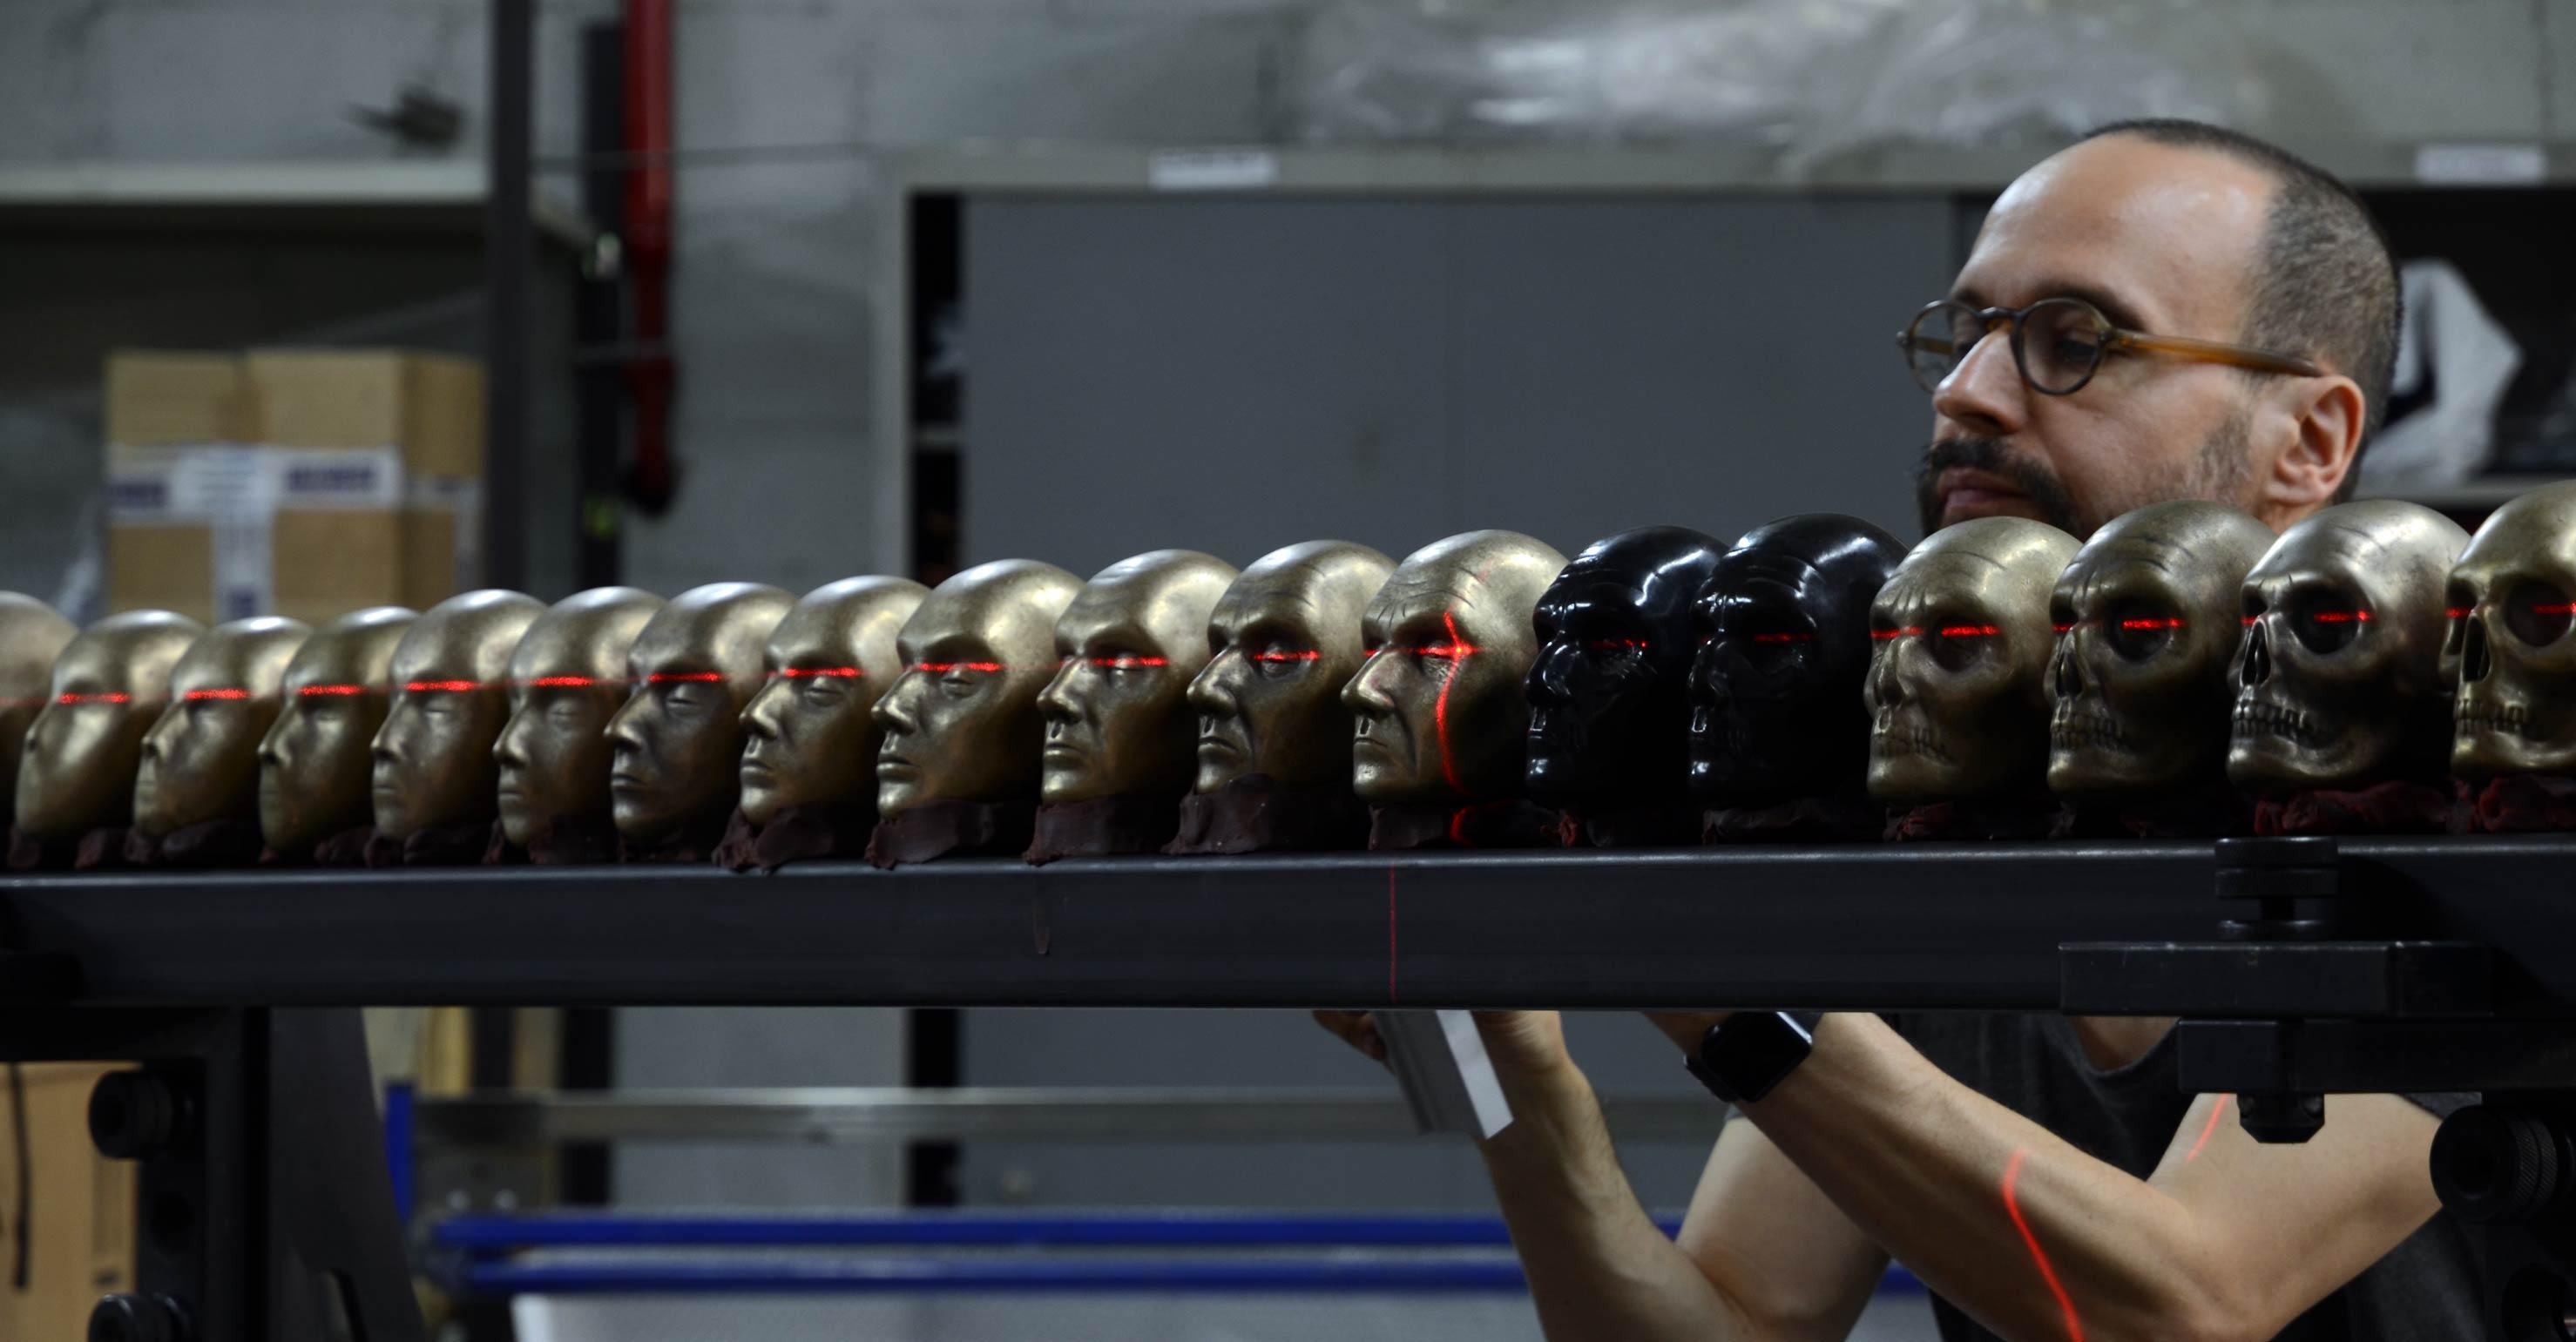 Javier Pérez trabajando en Alfa Arte. Obra: INFINITO PRIVADO